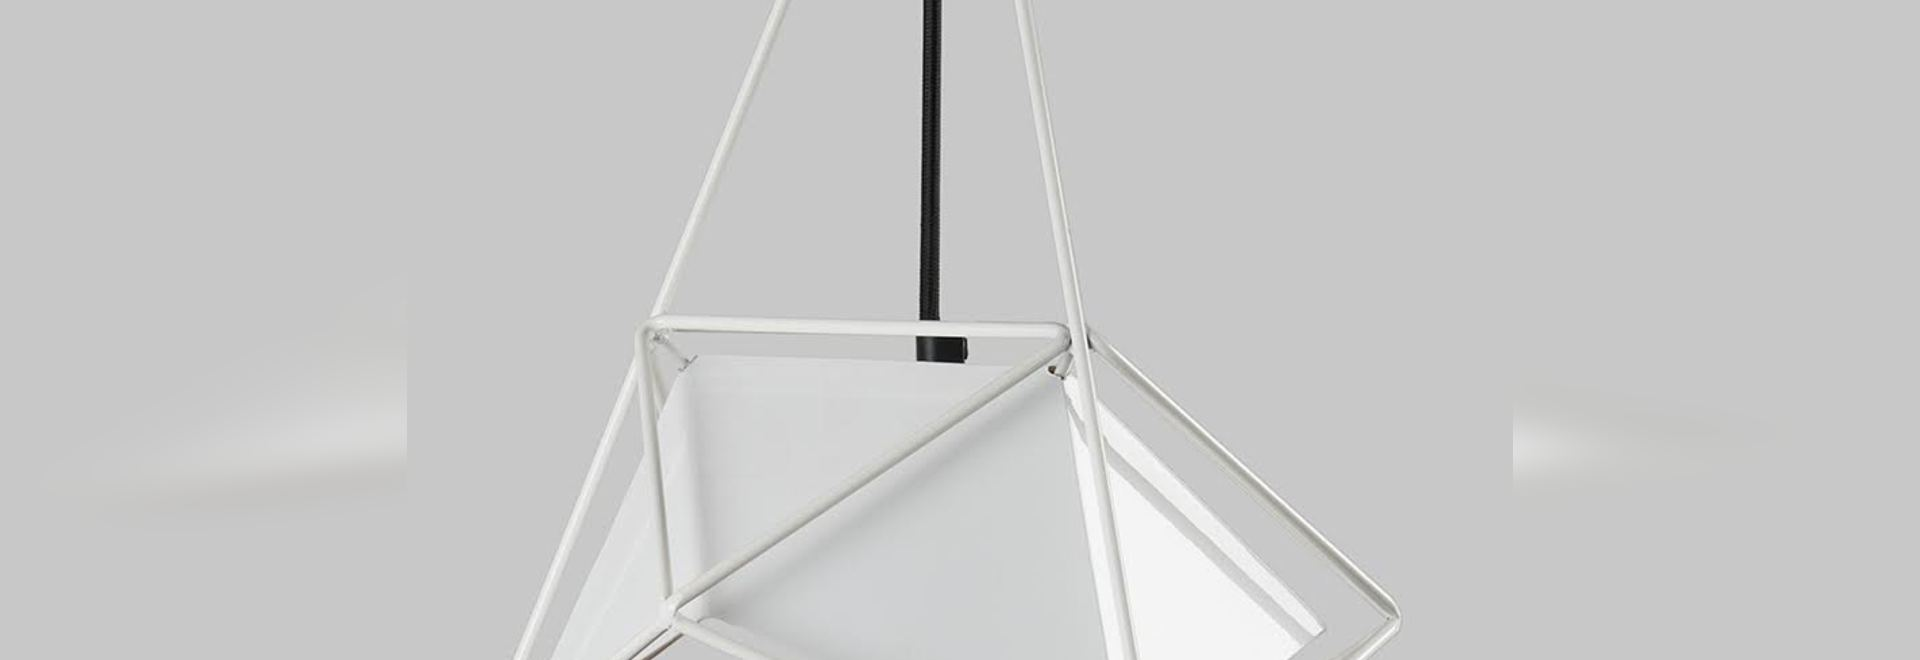 "U32-1 ""presents a distinct angular dialogue, between surface and frame."""